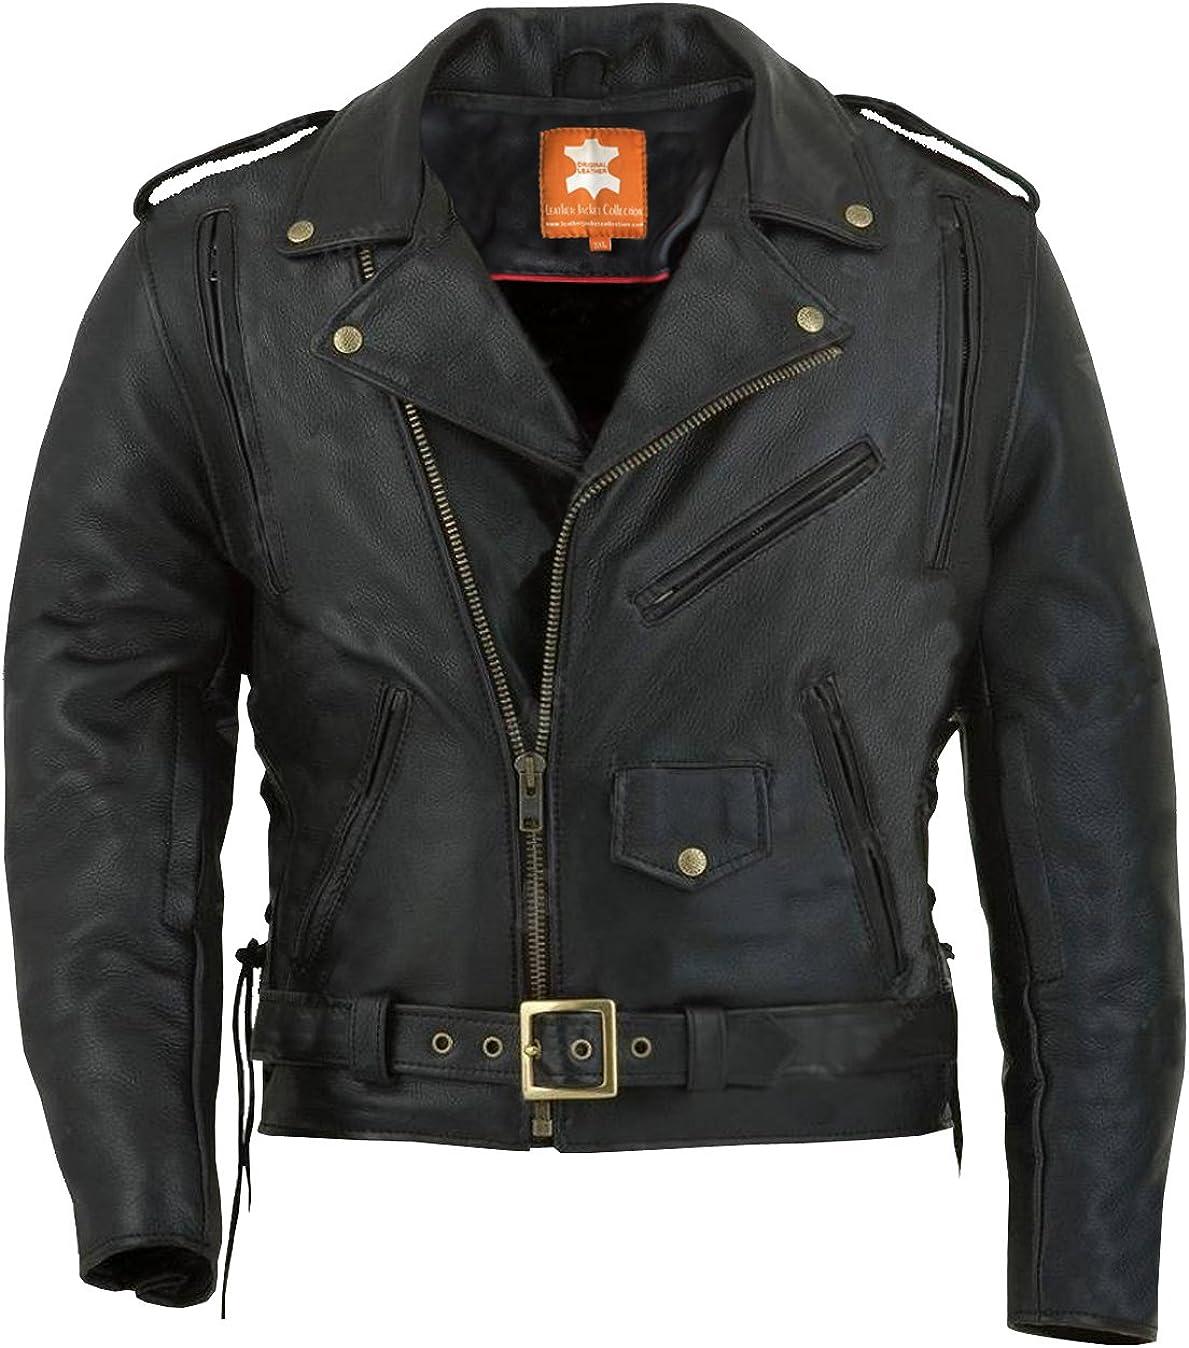 Real Cowhide Heavy Weight Original Leather Black Color Biker Jacket Thick Gauge